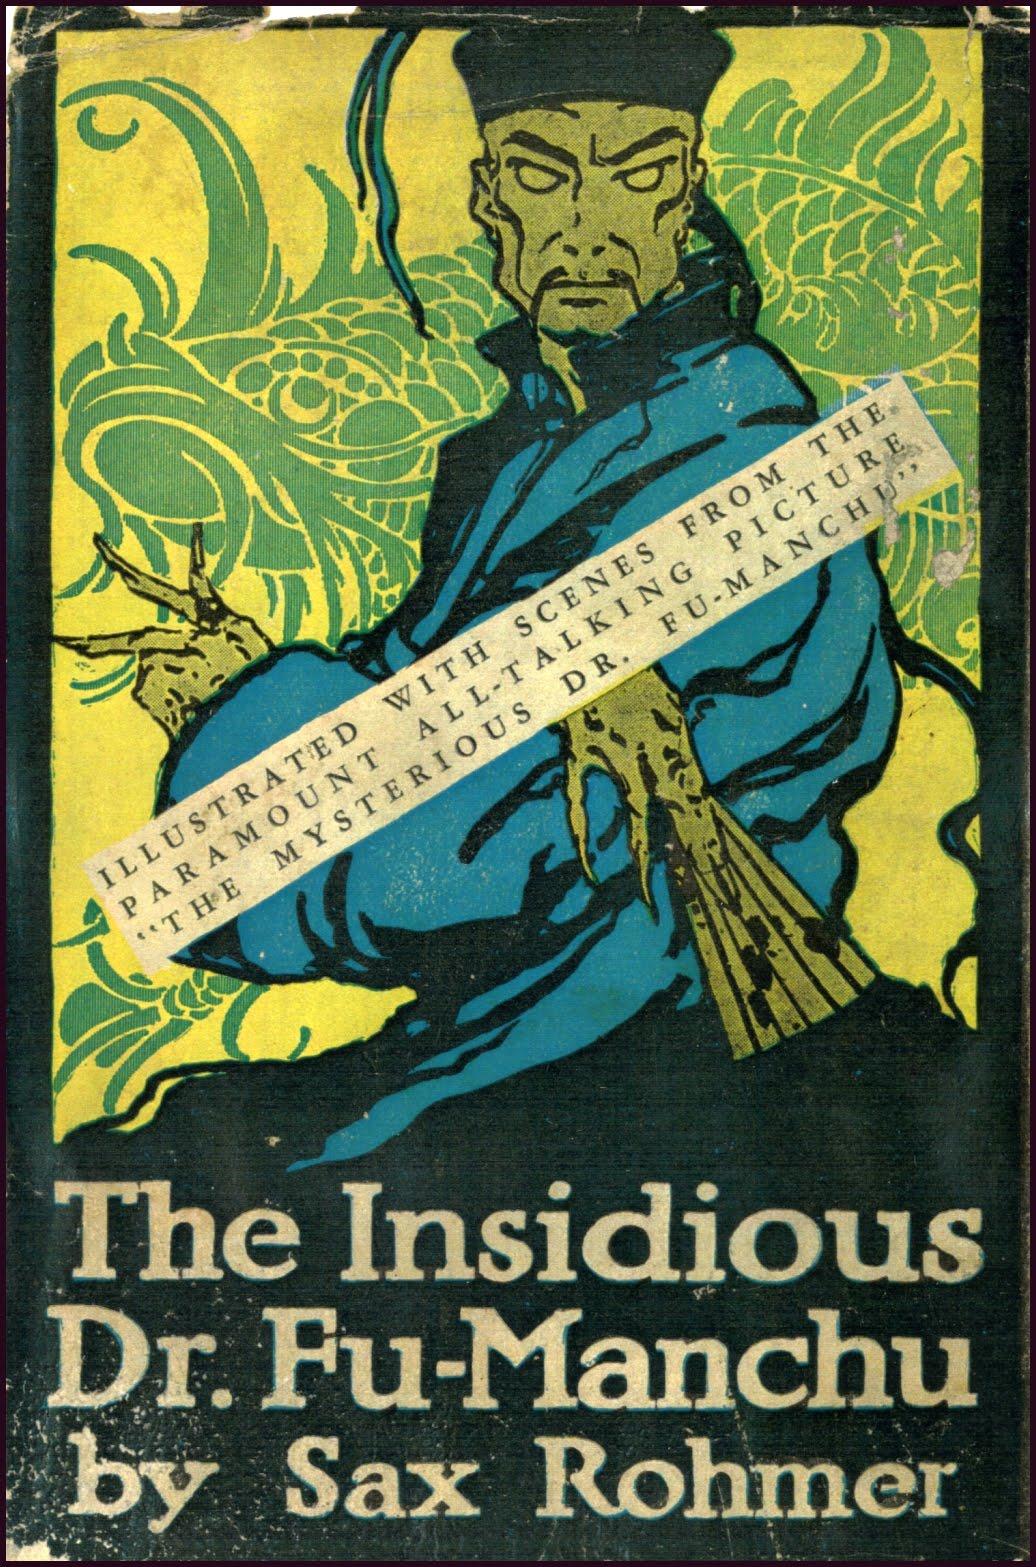 f7ebcfbccfb43 The Insidious Dr. Fu Manchu – Pulp Covers